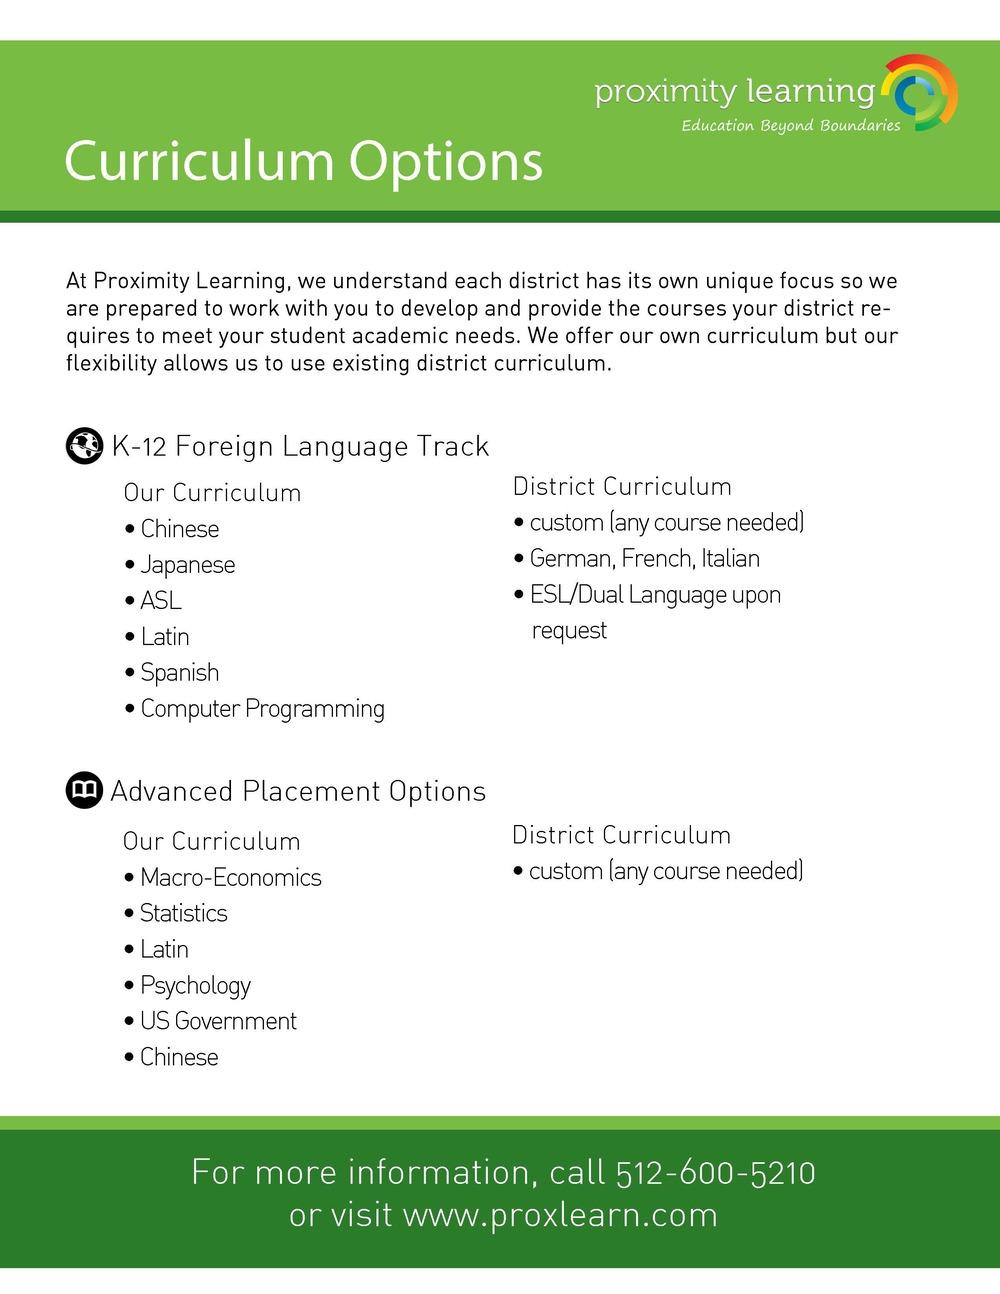 Curriculum Options – Basic